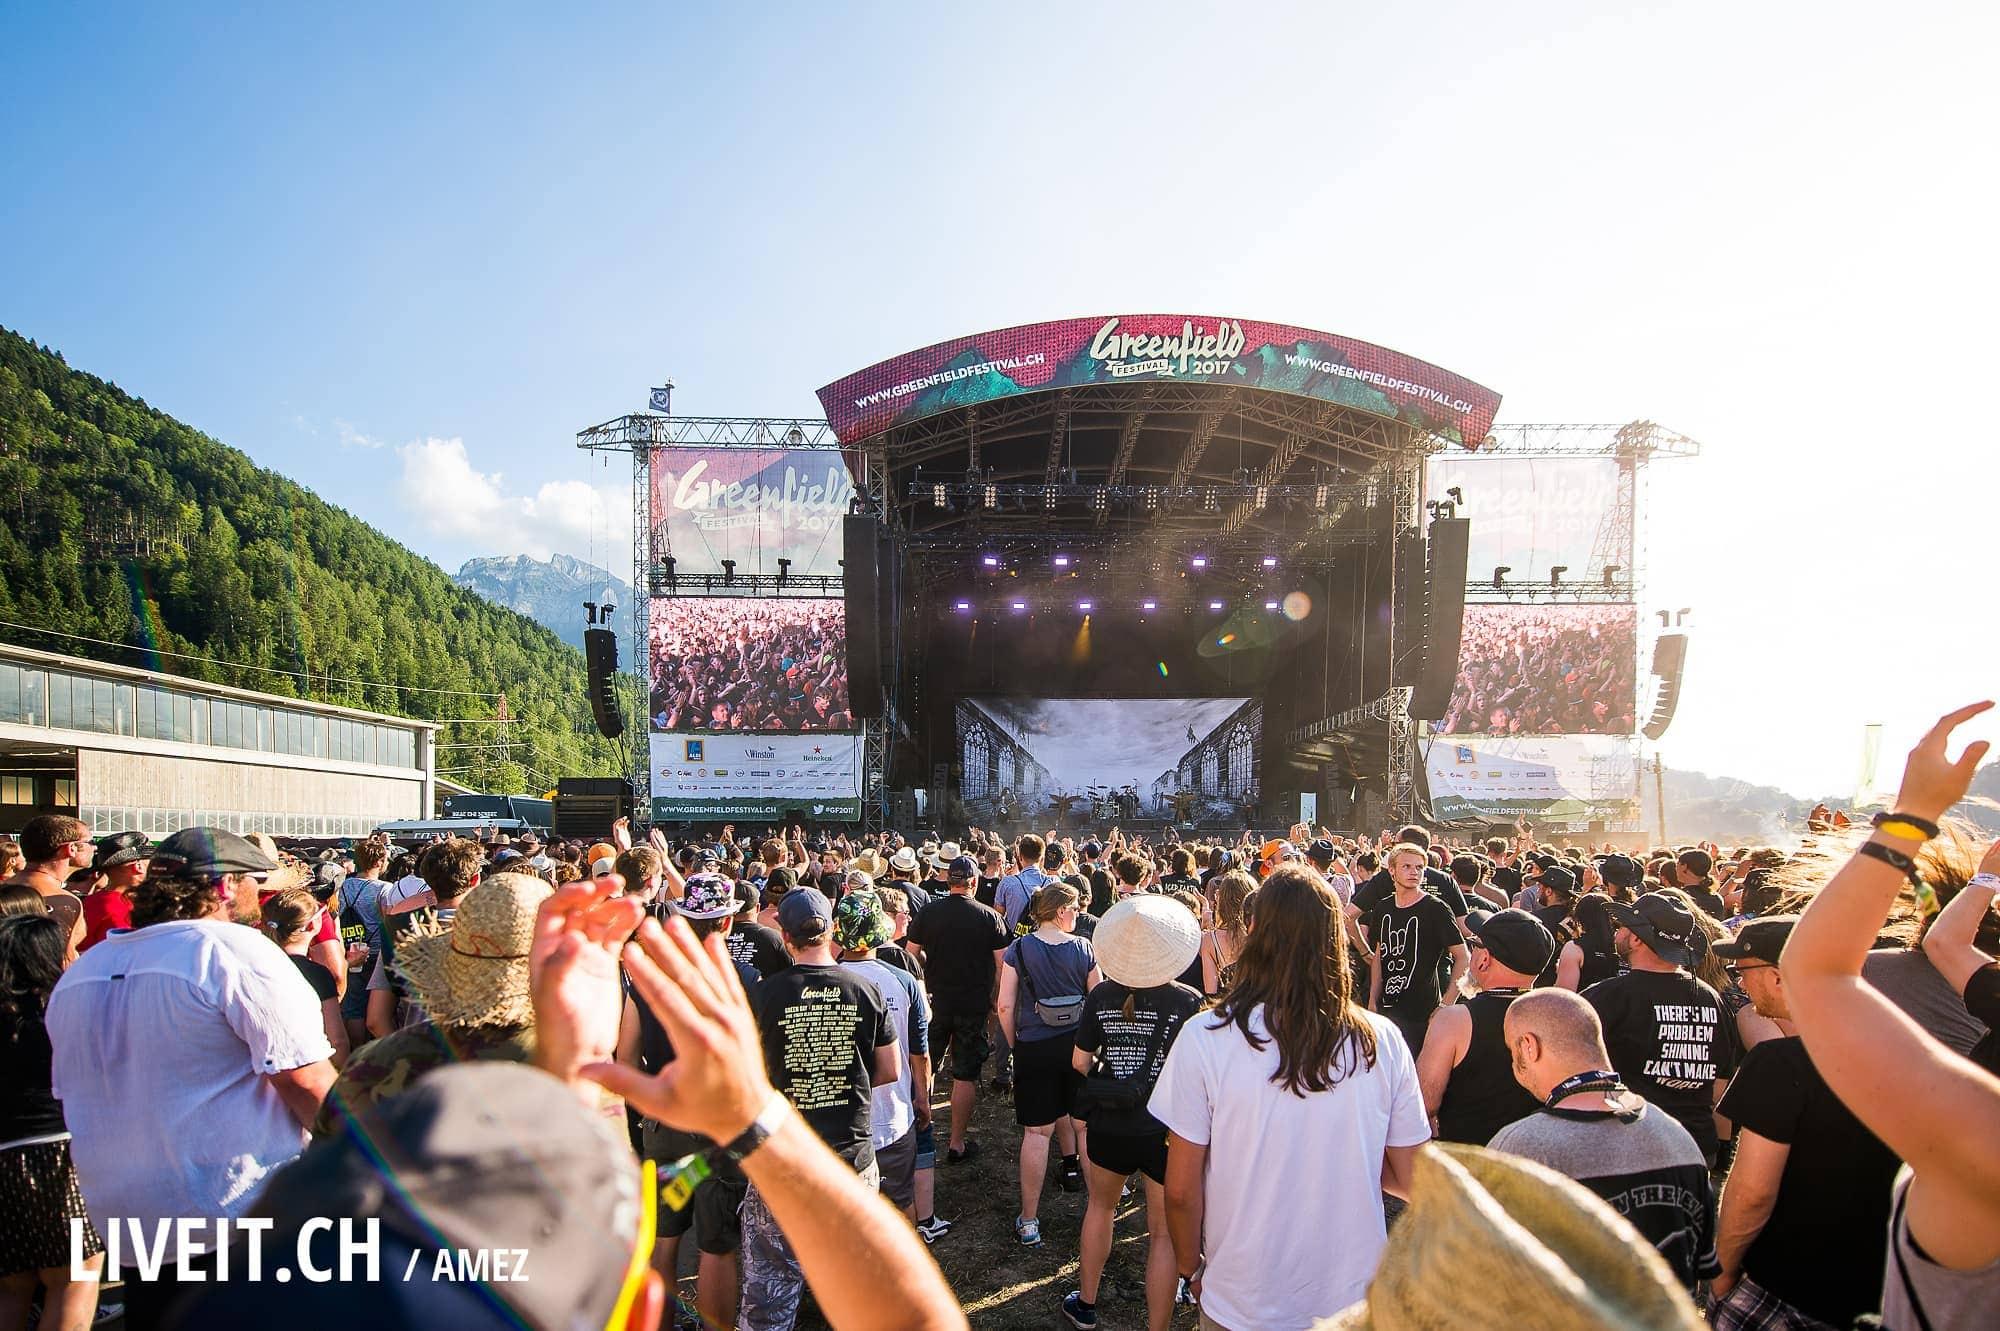 SCHWEIZ GREENFIELD FESTIVAL 2017